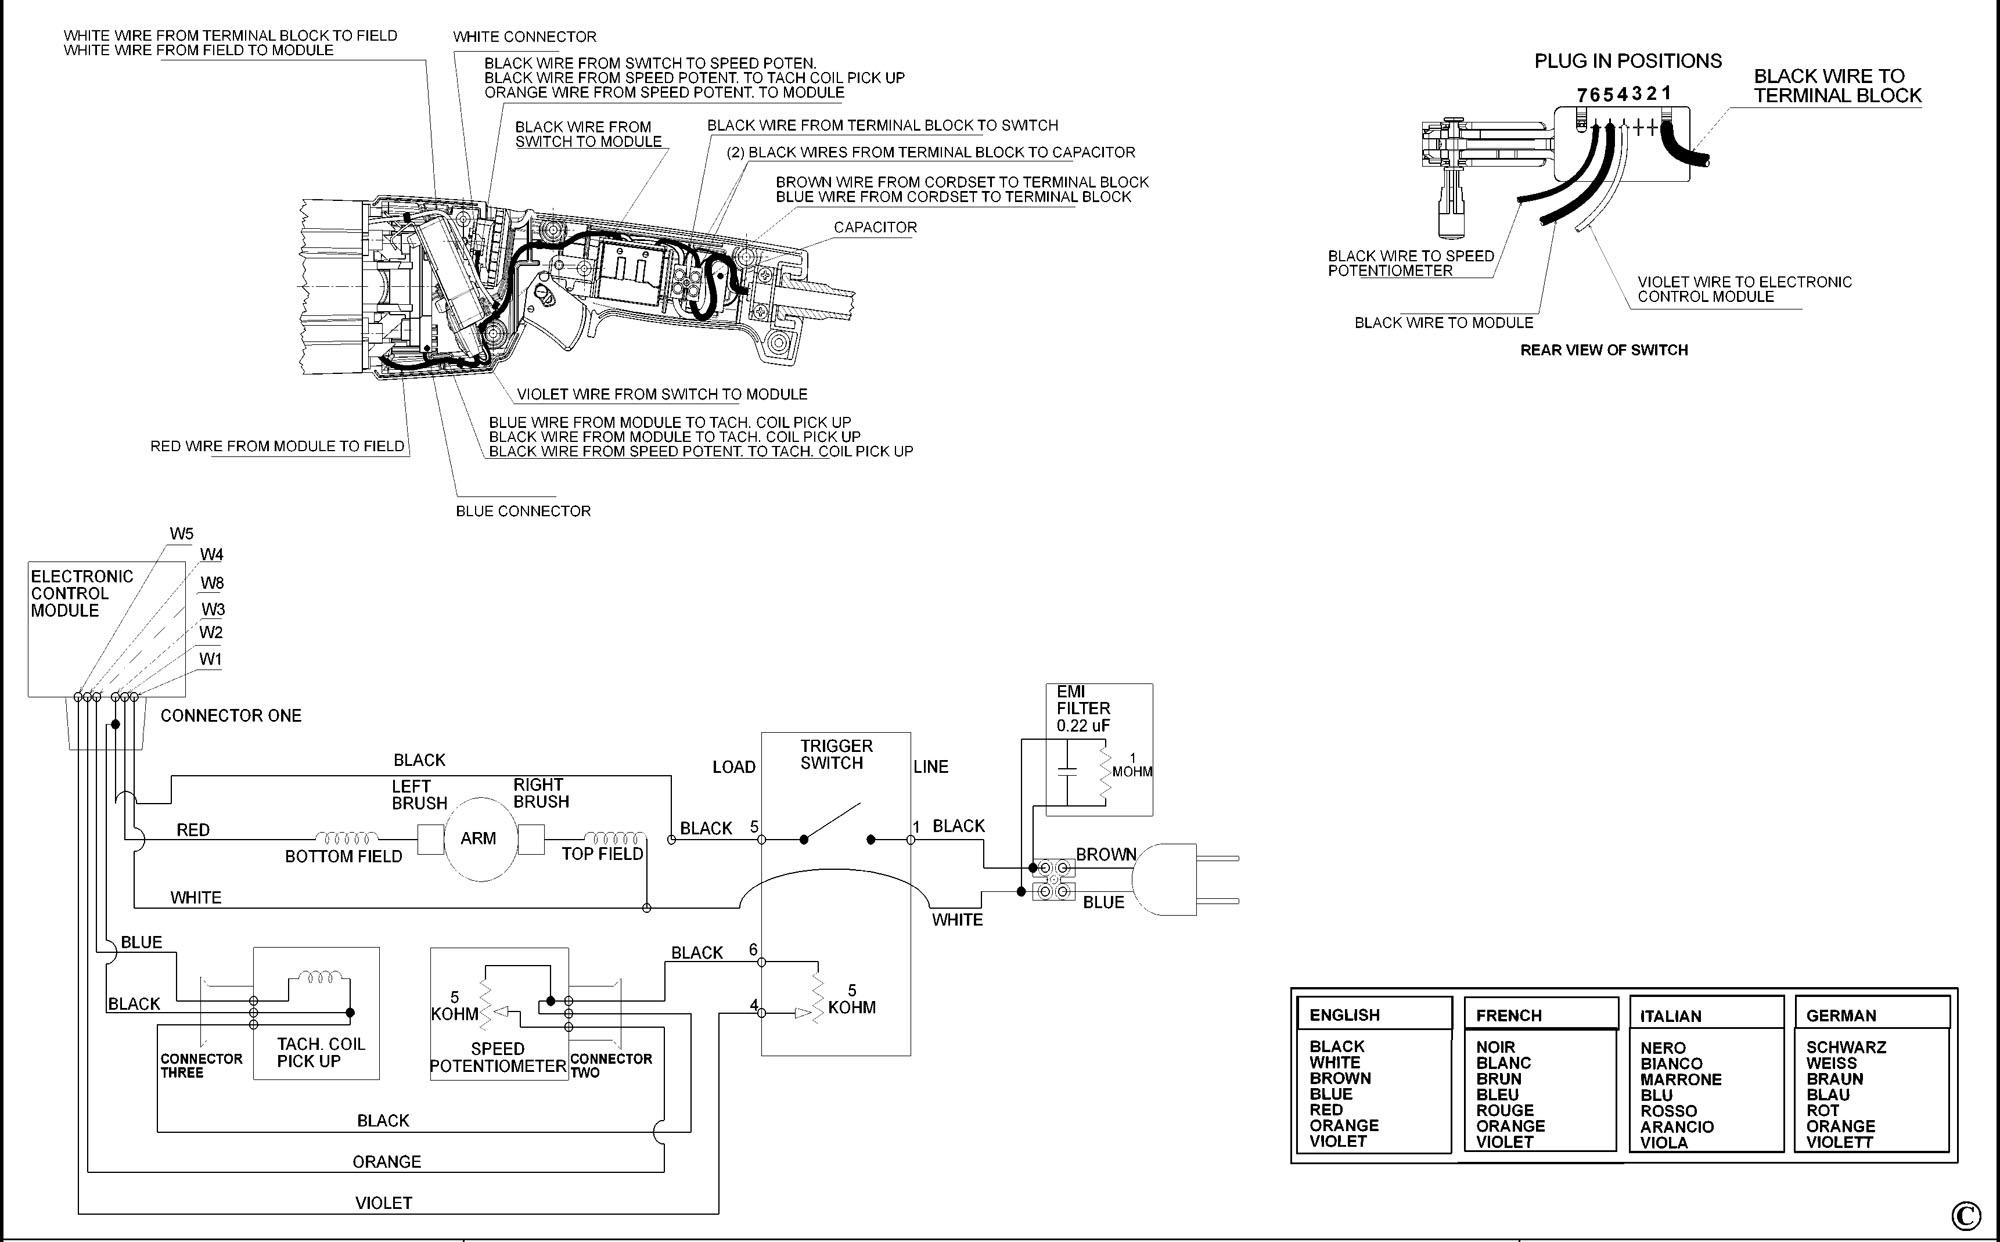 [DIAGRAM_38DE]  FX_4506] De Walt Power Tool Wiring Diagrams Download Diagram   Dewalt Wiring Diagram      None Inki Isra Mohammedshrine Librar Wiring 101